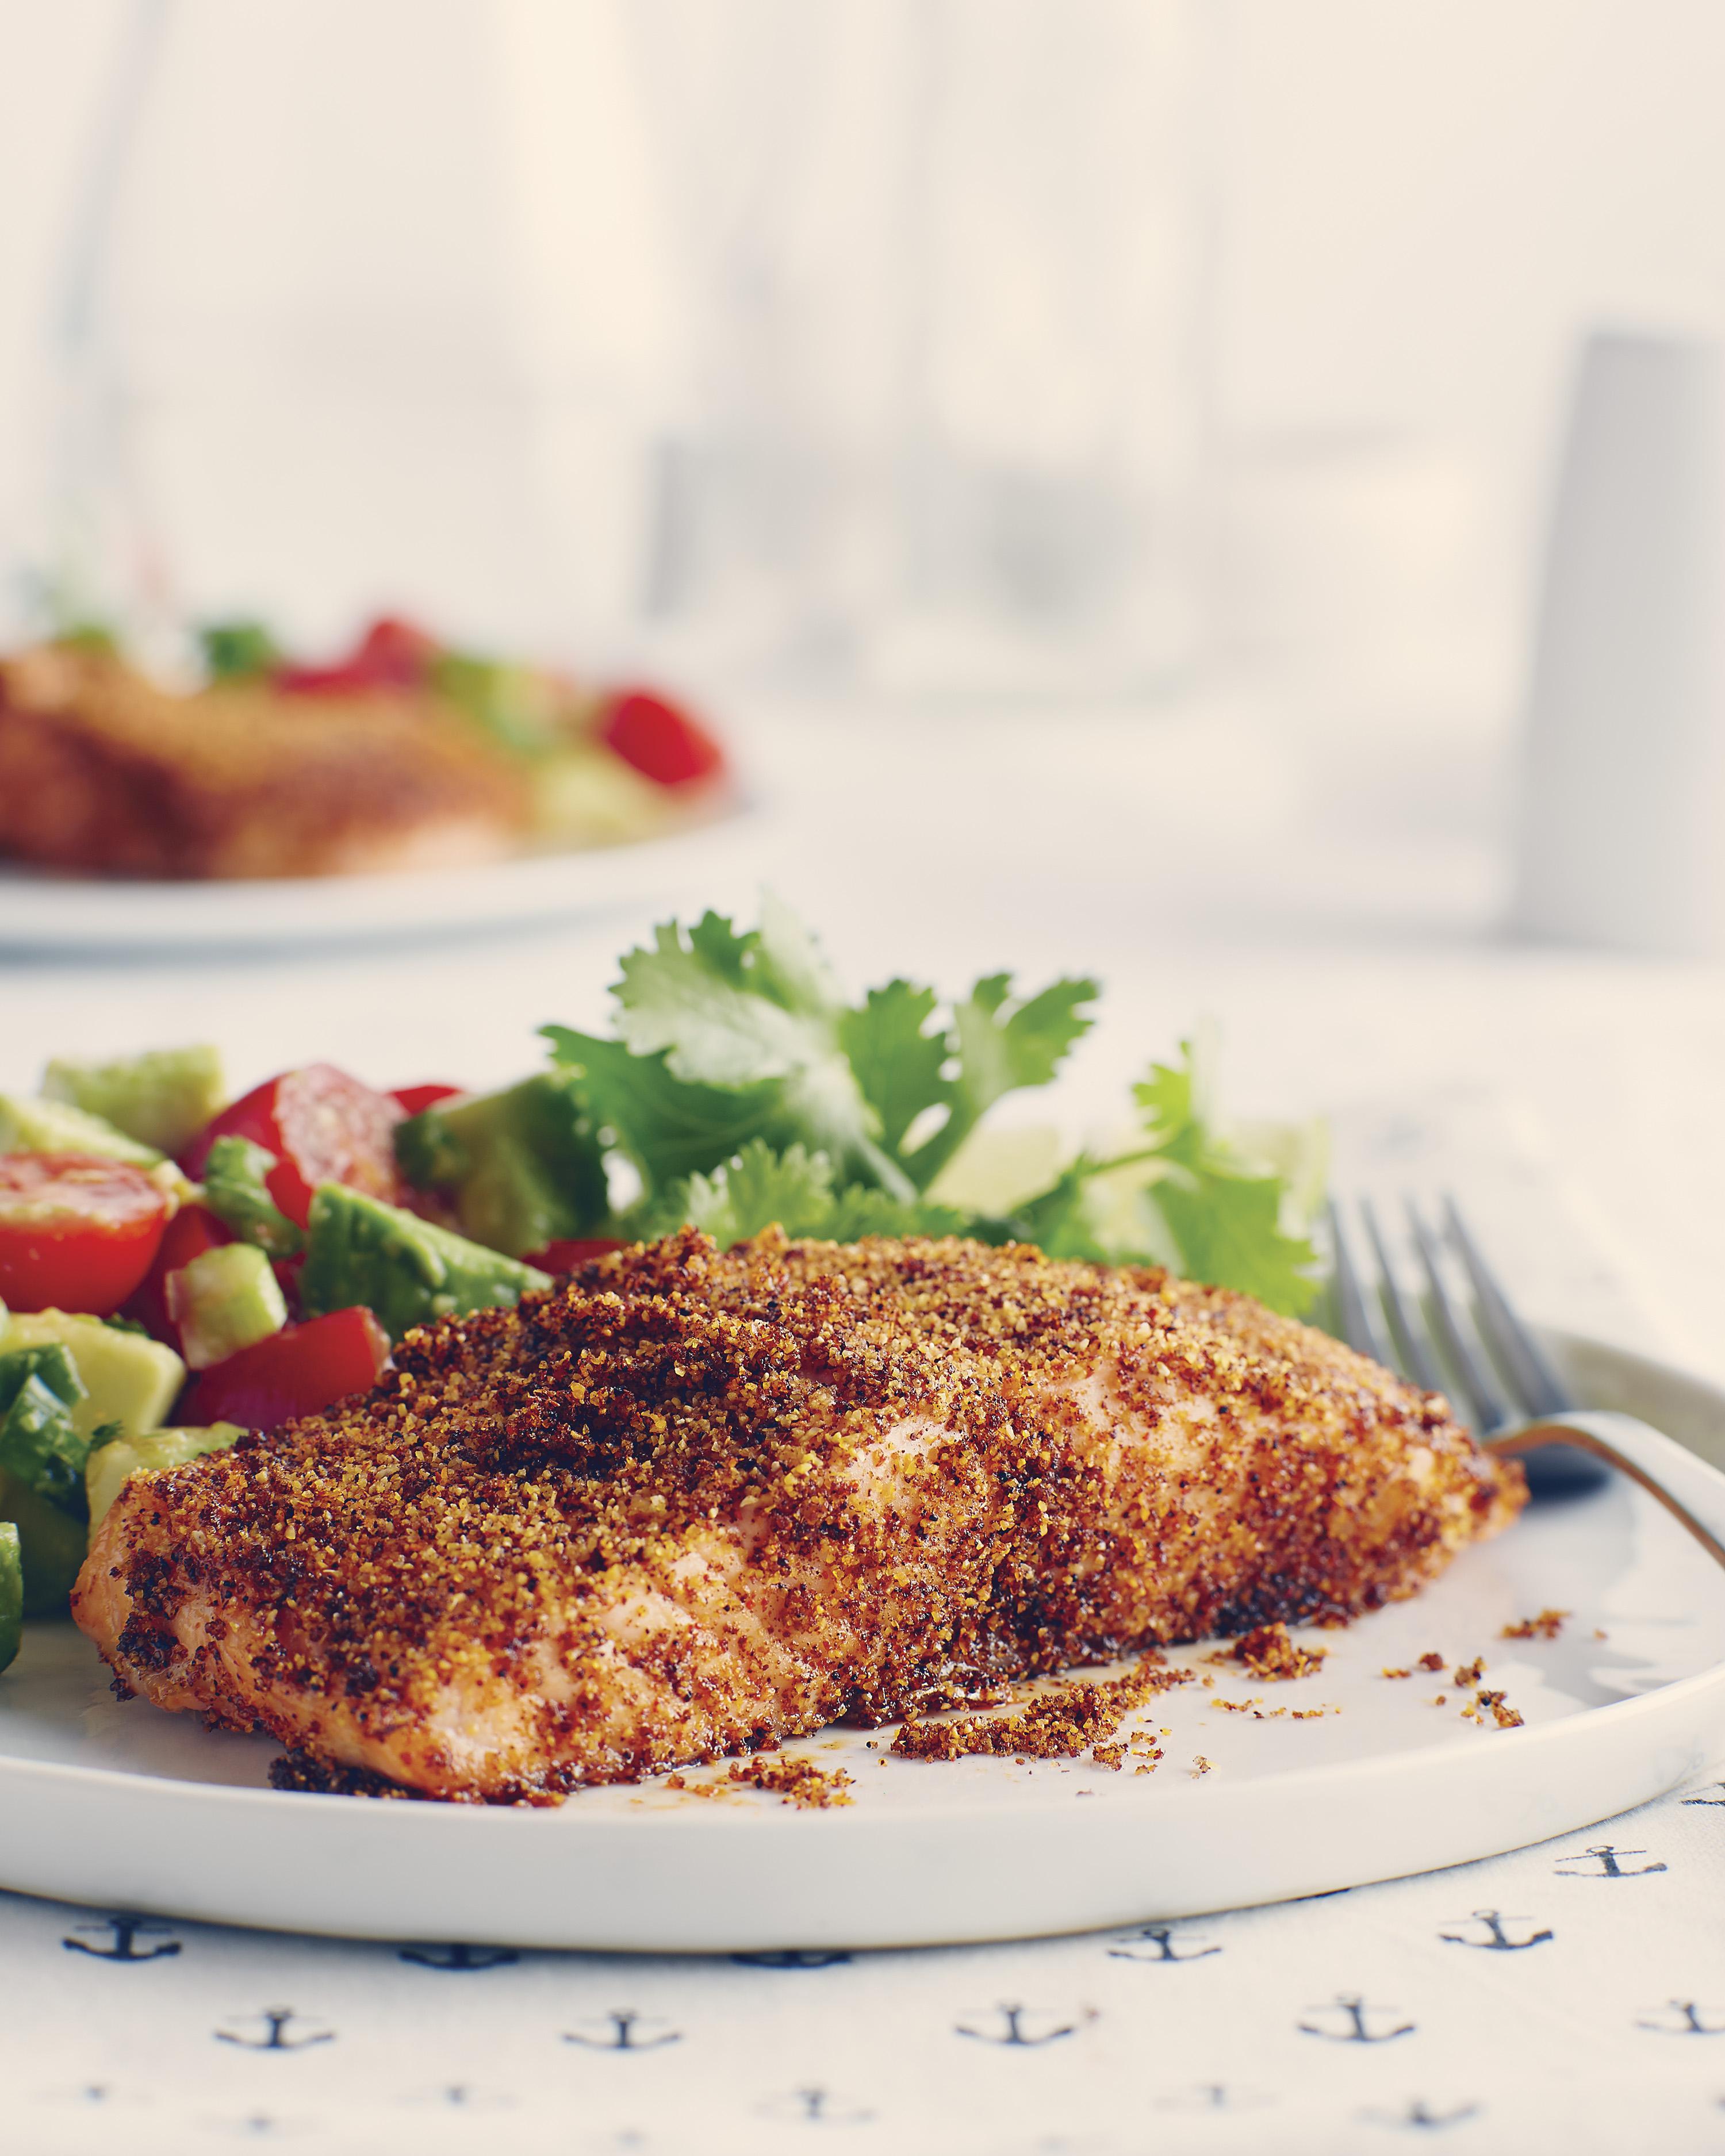 Chili Crusted Salmon